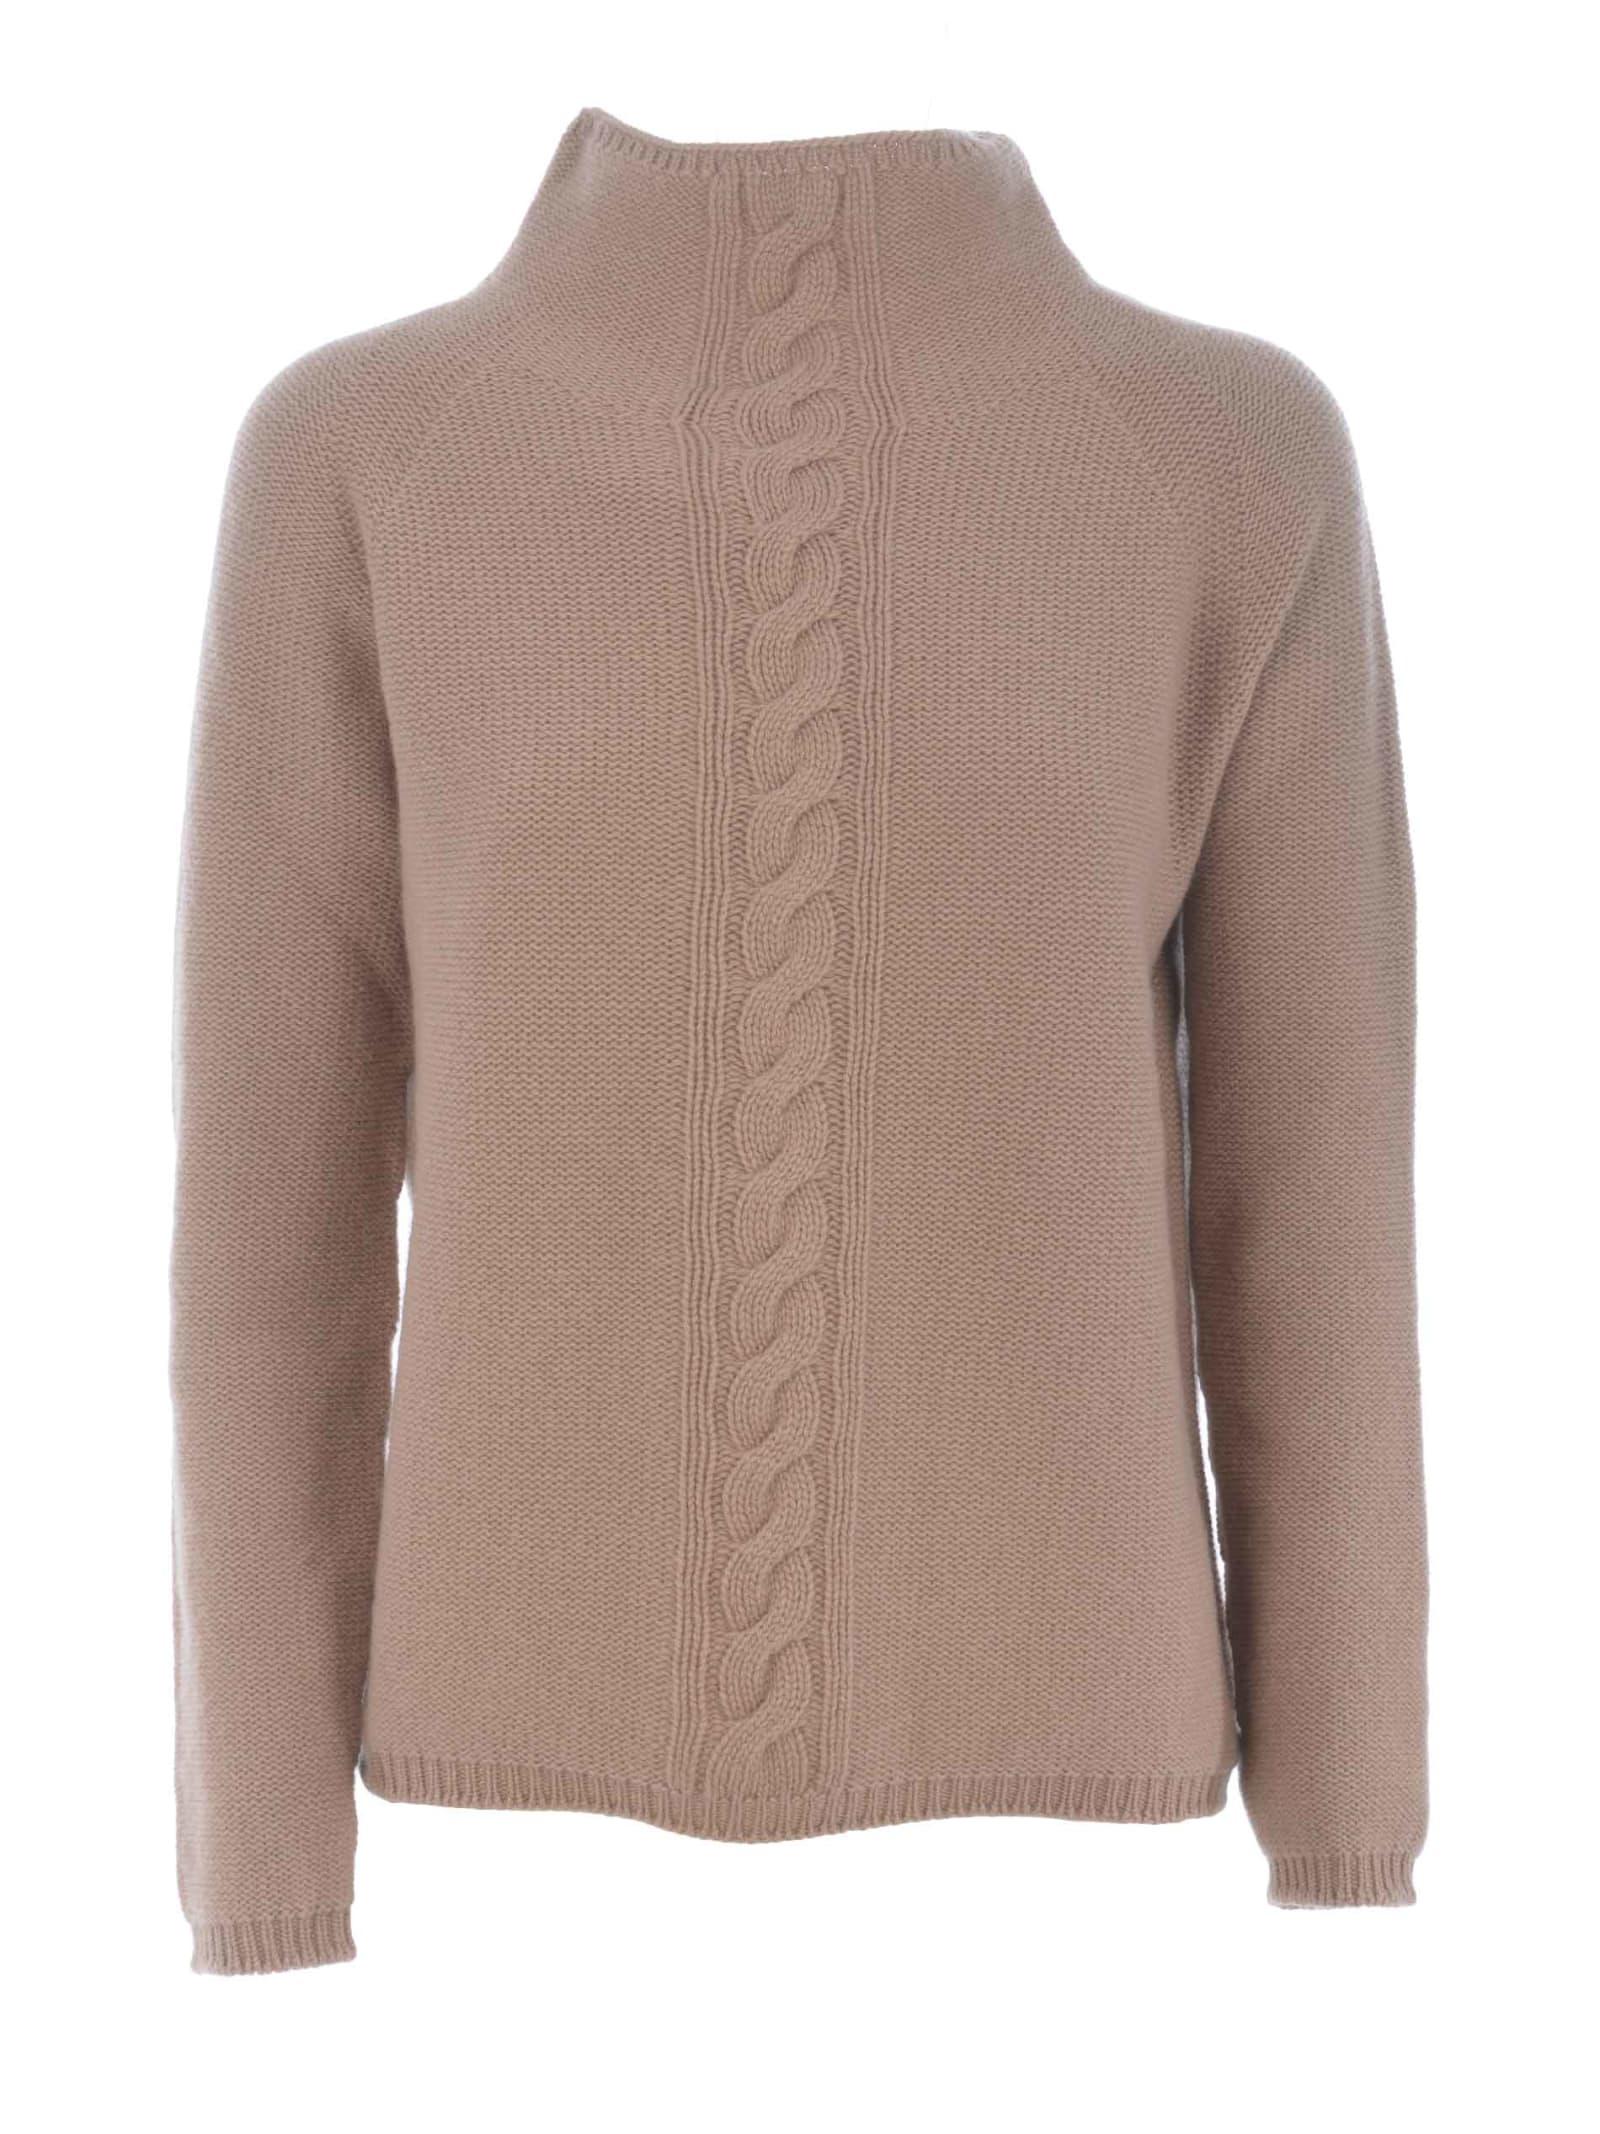 Max Mara Sweater In Cammello